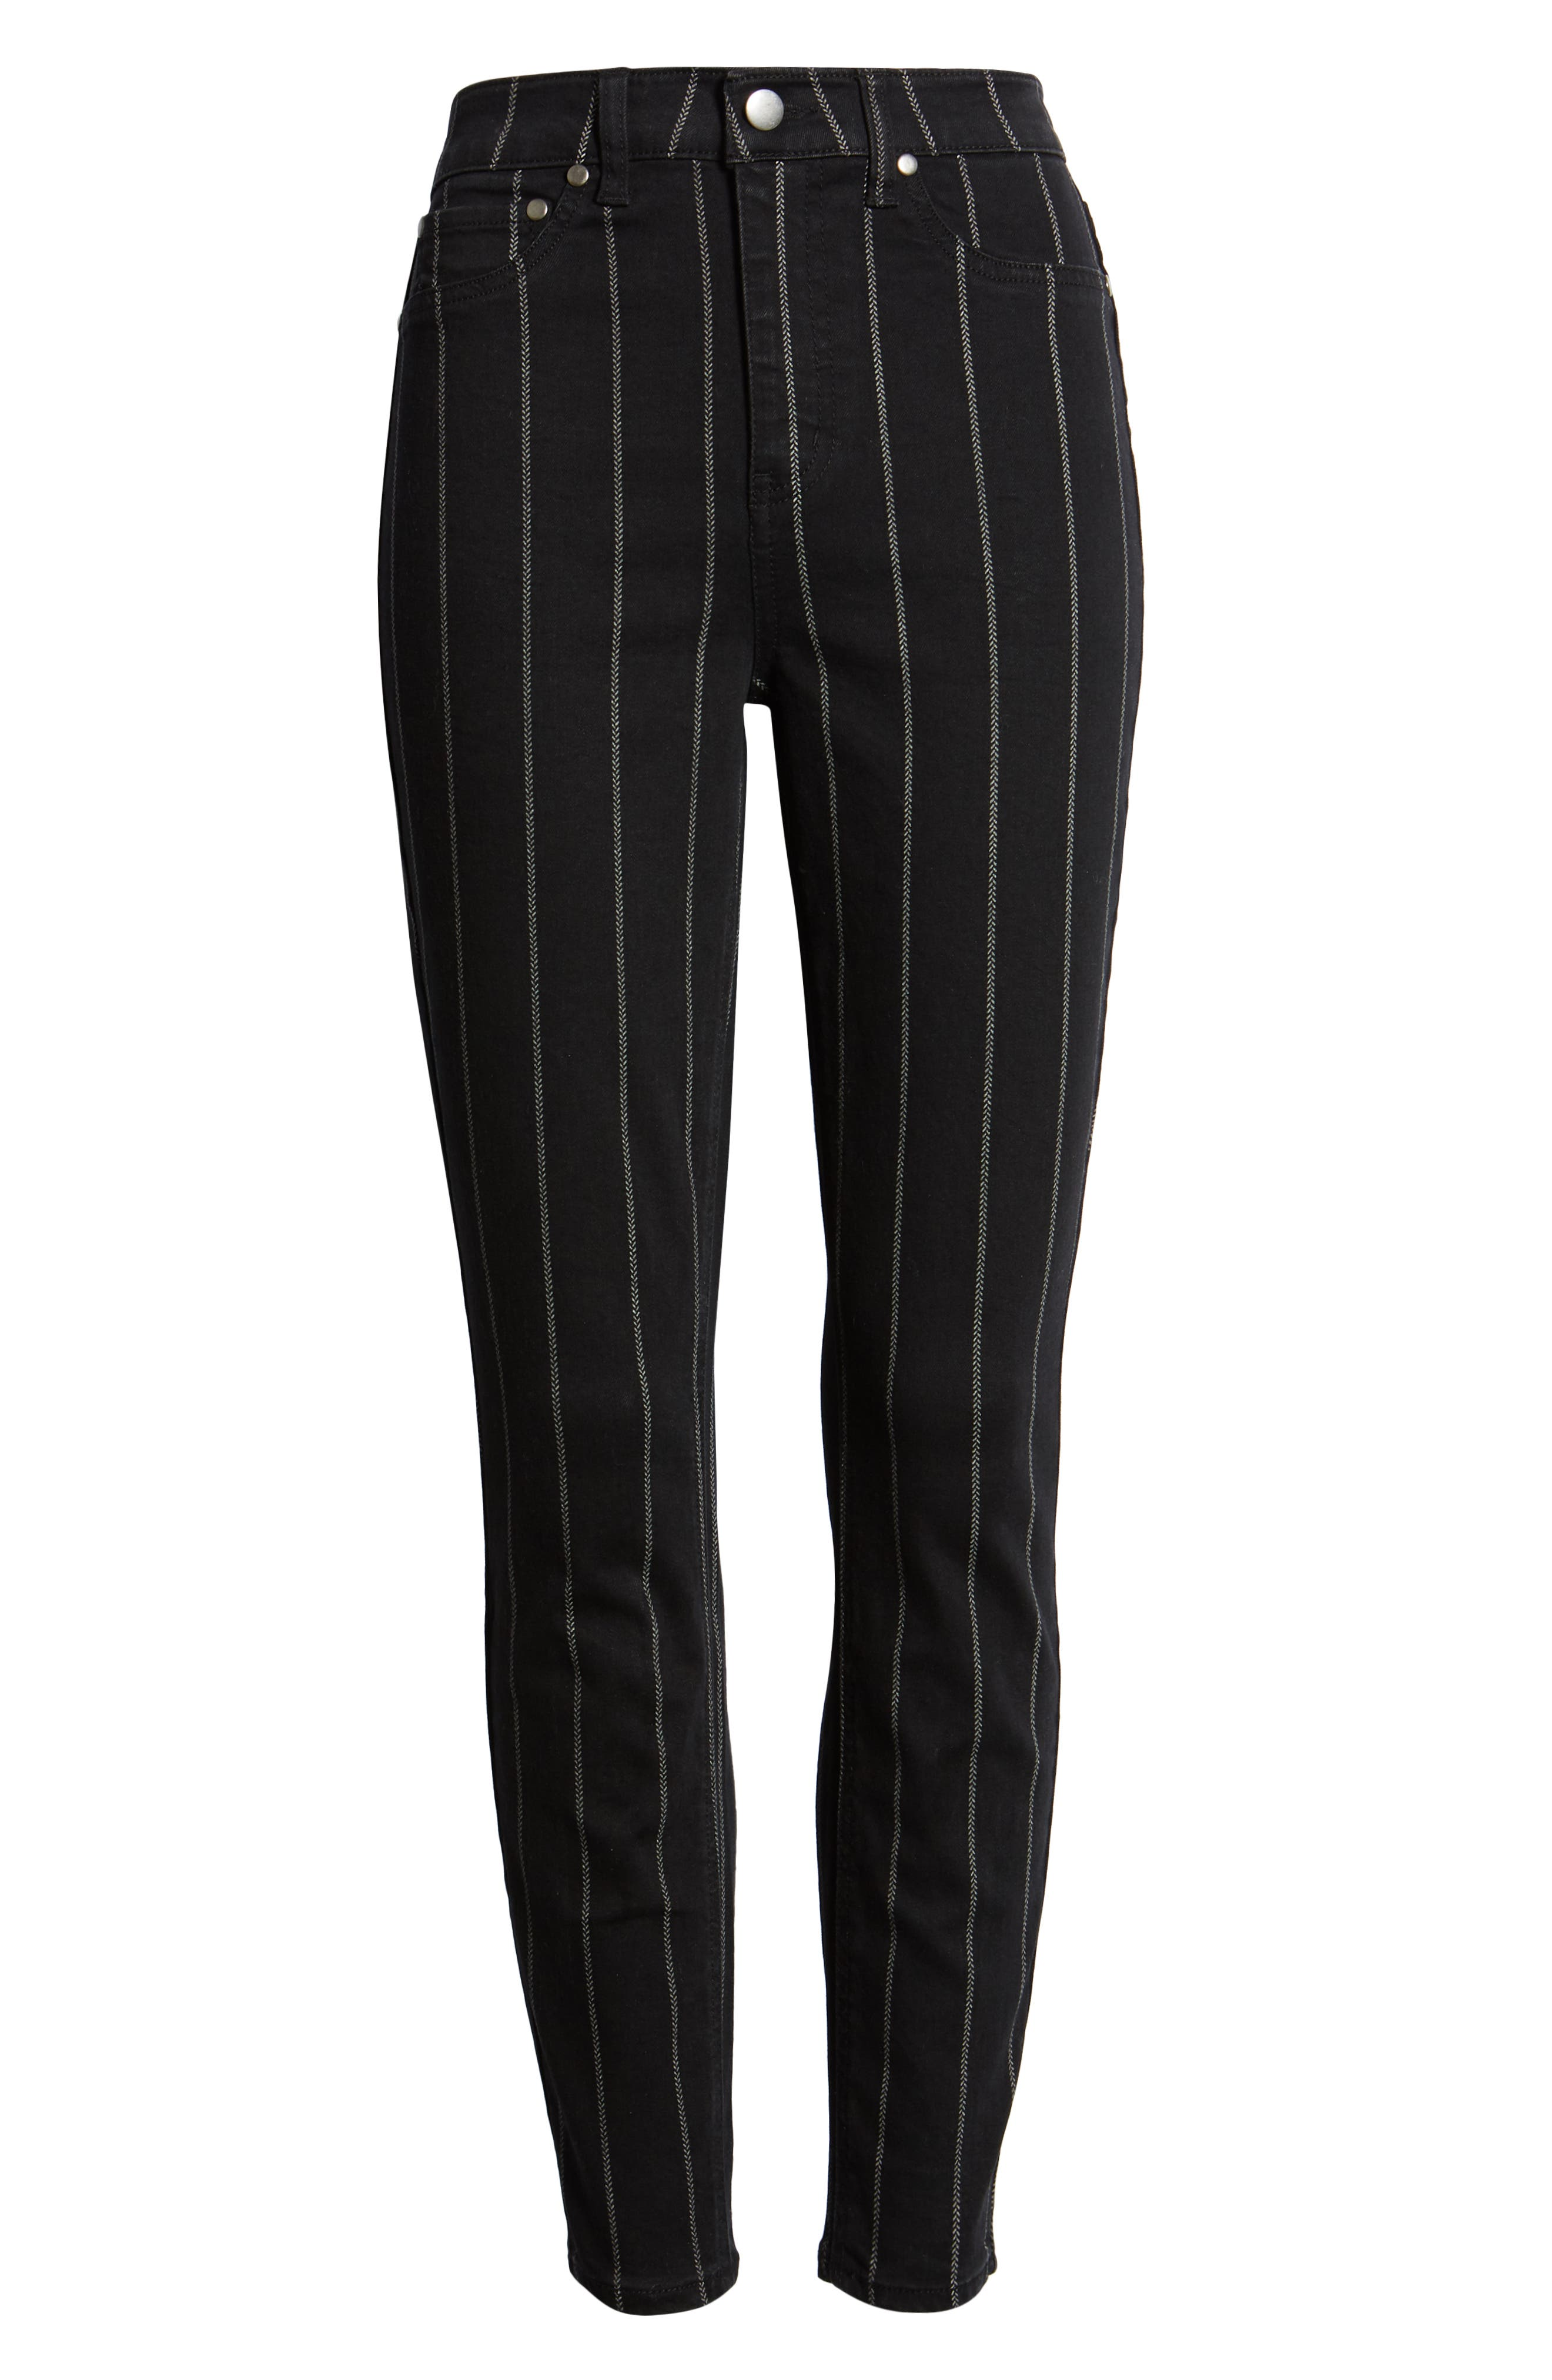 TINSEL, Stripe High Rise Skinny Jeans, Alternate thumbnail 7, color, 001